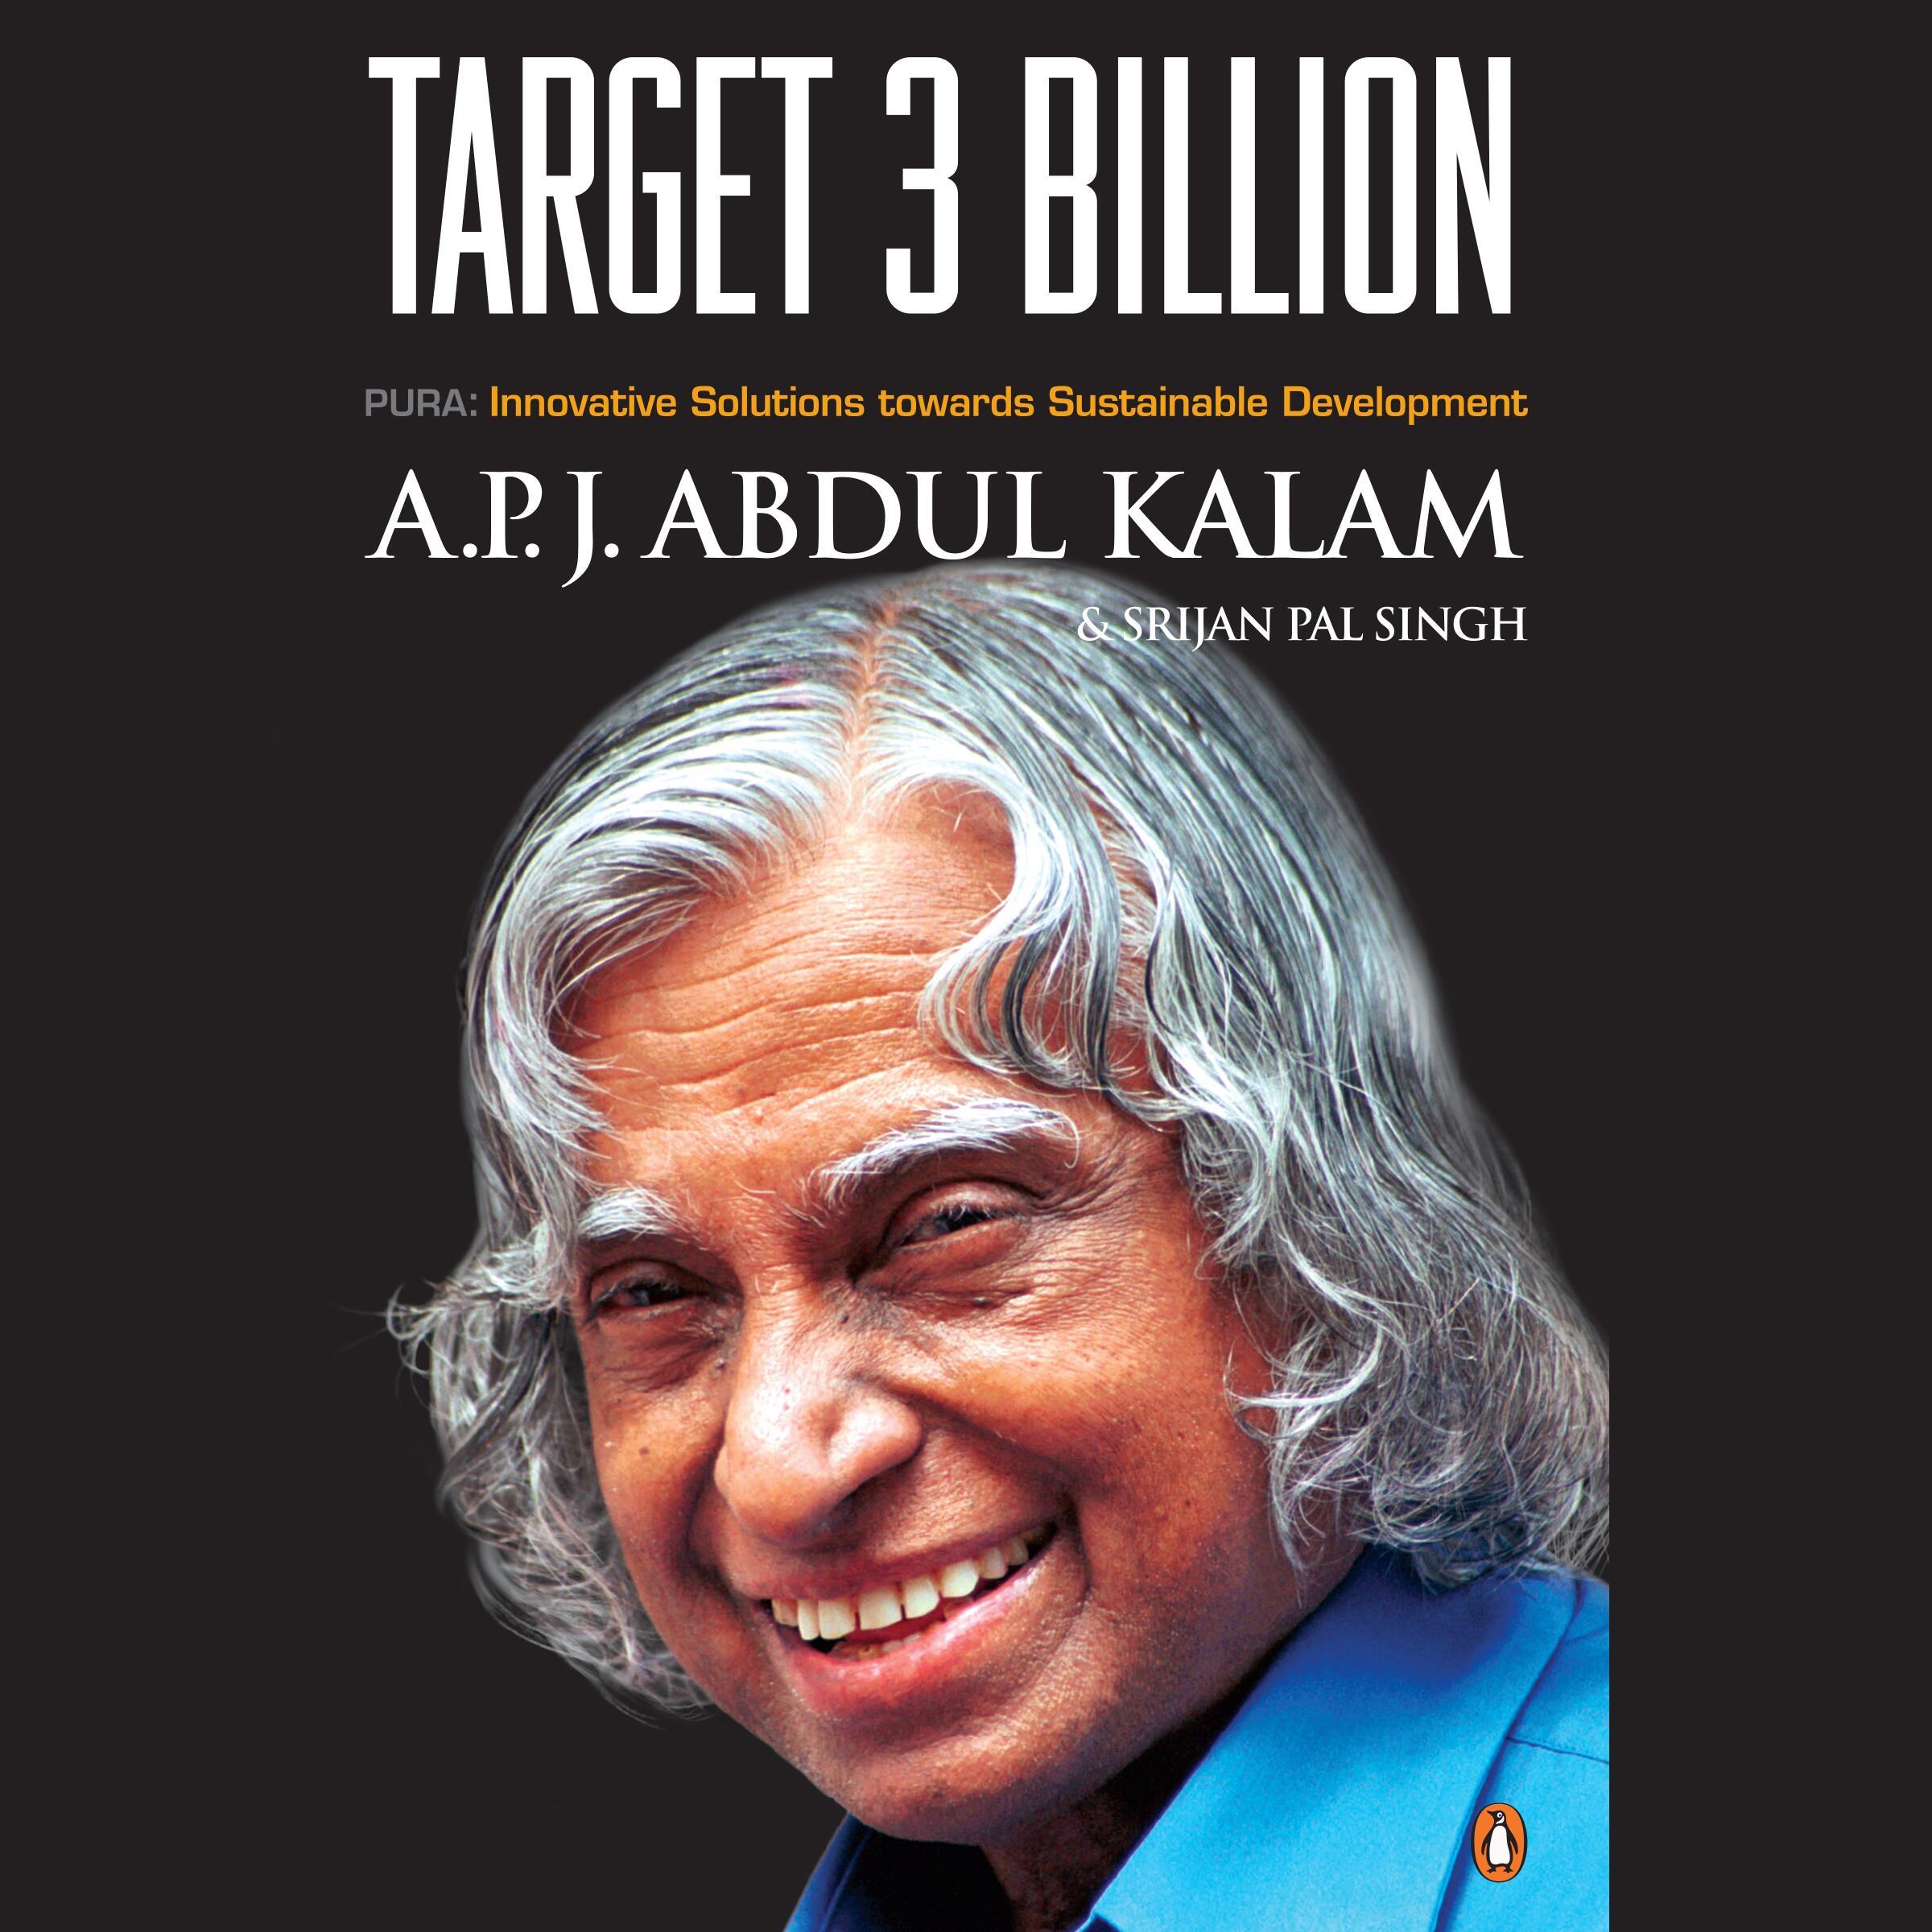 Target 3 Billion